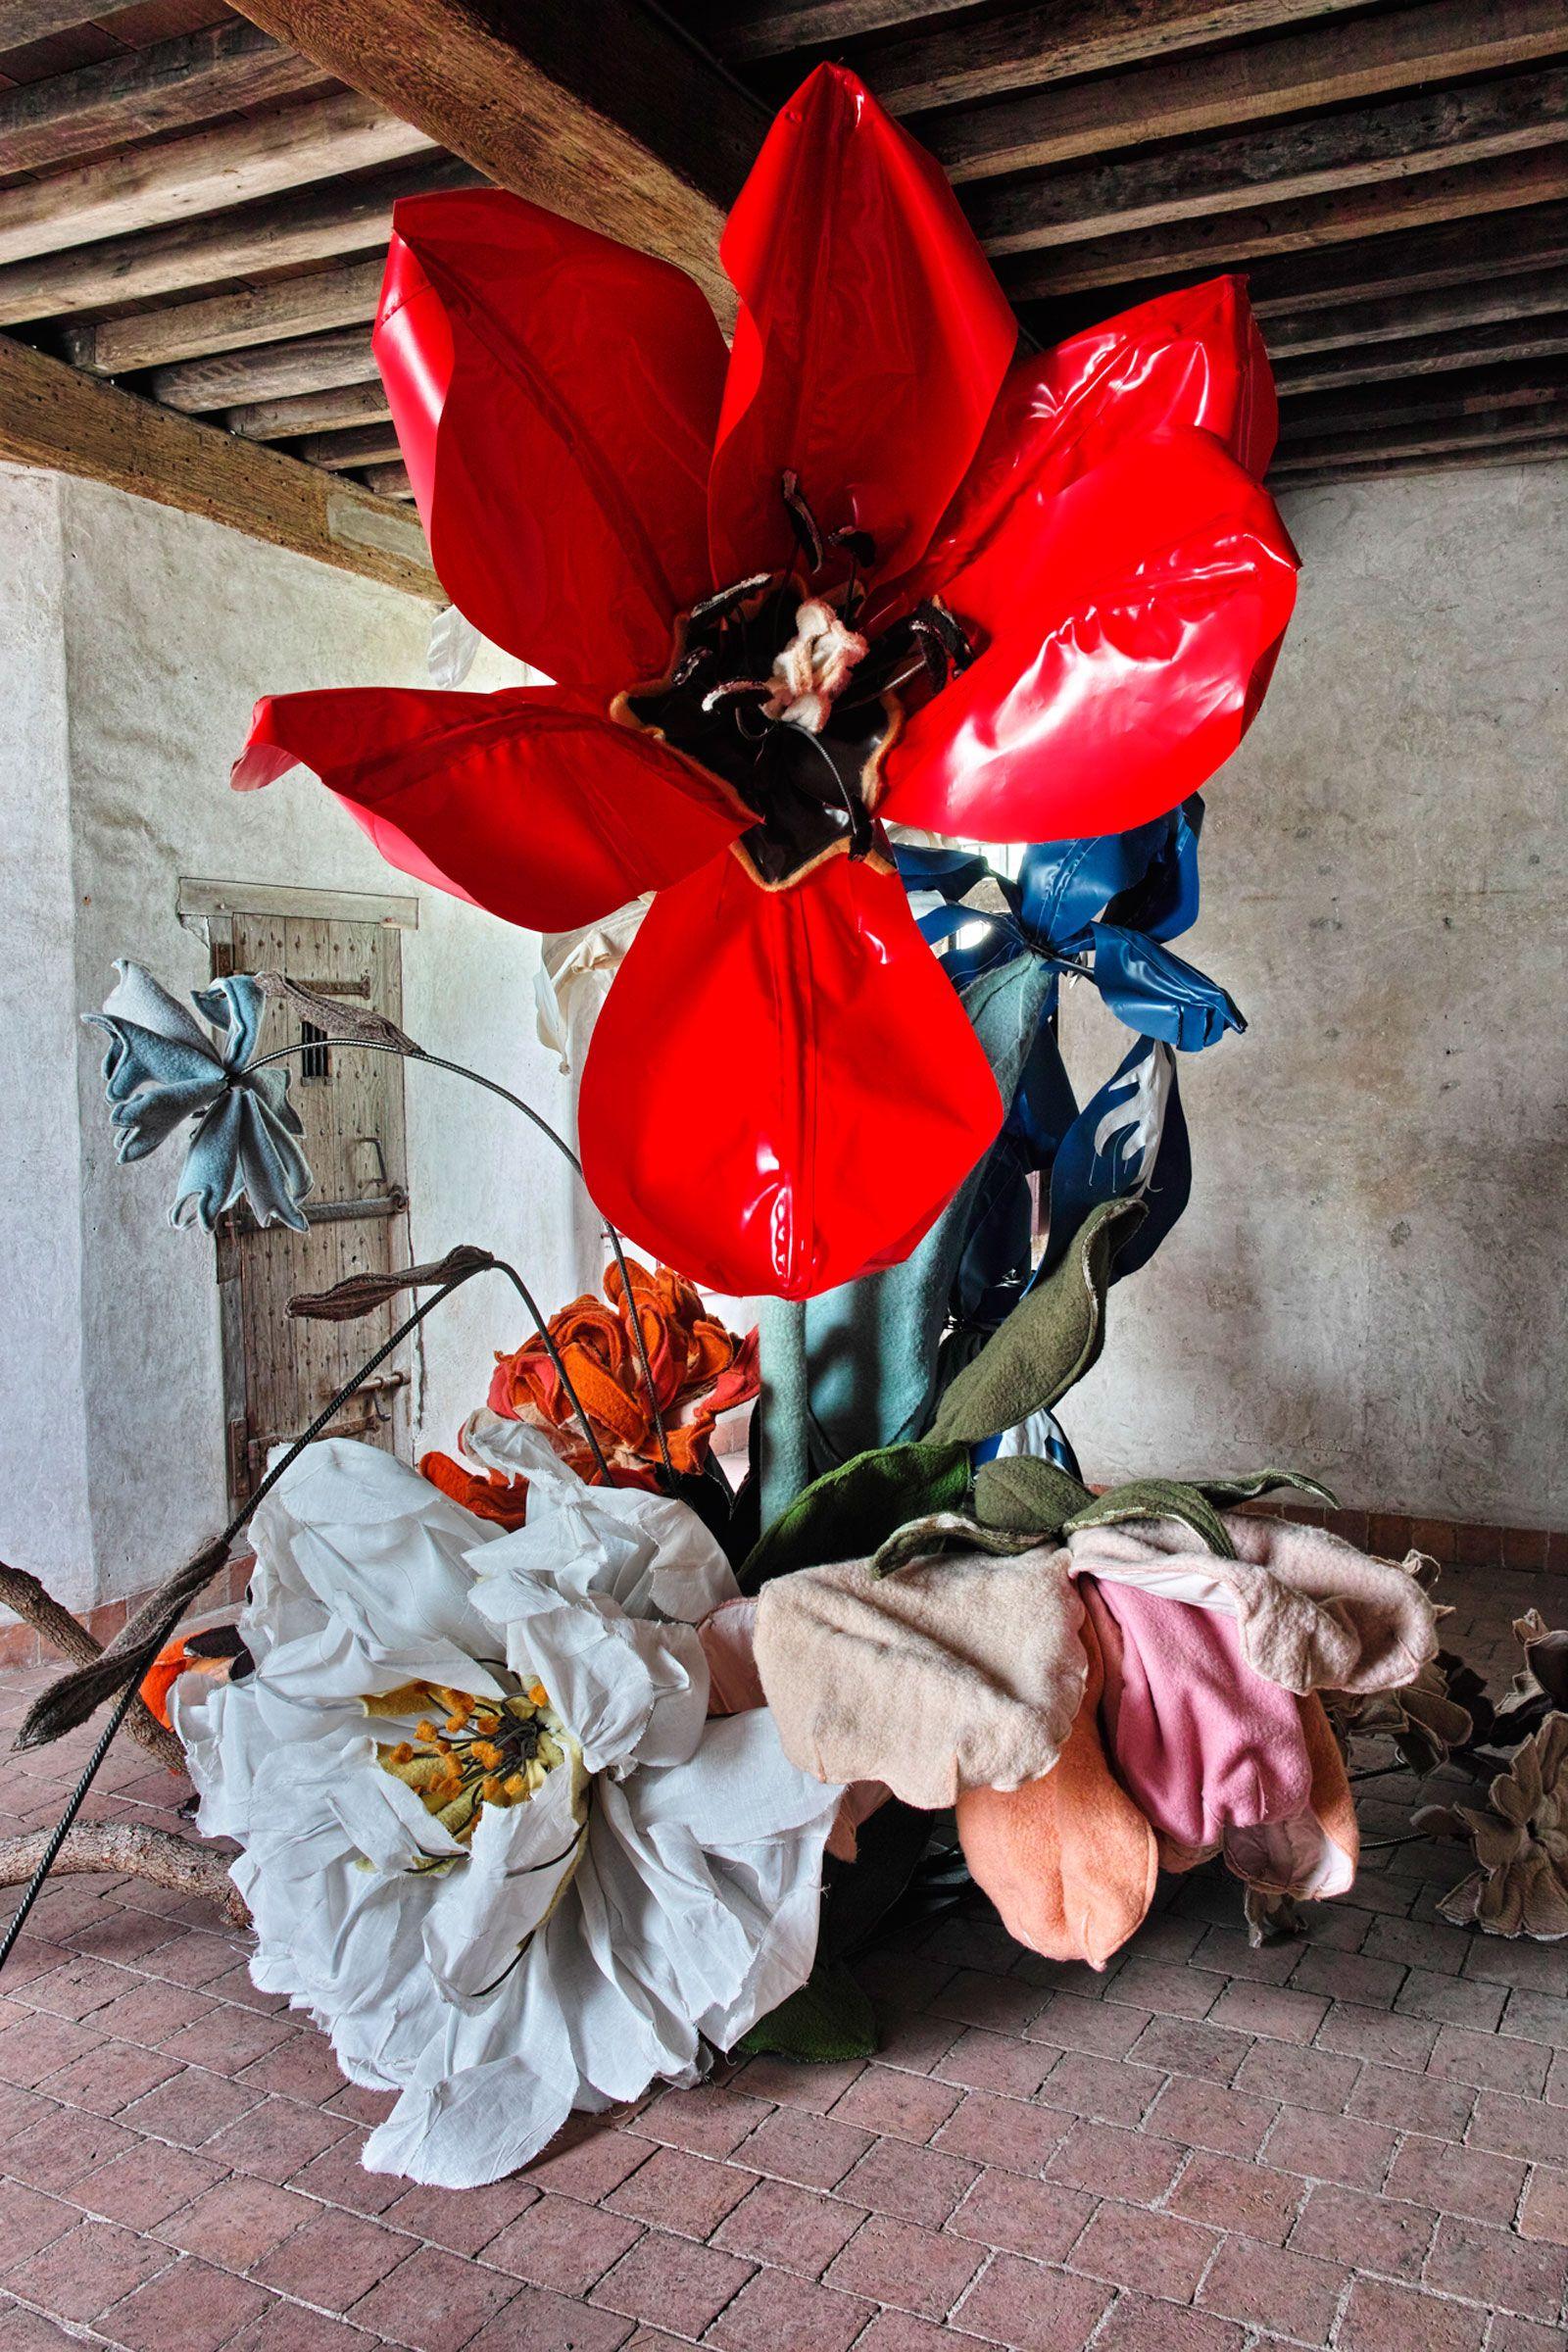 Flores arte compositi 2